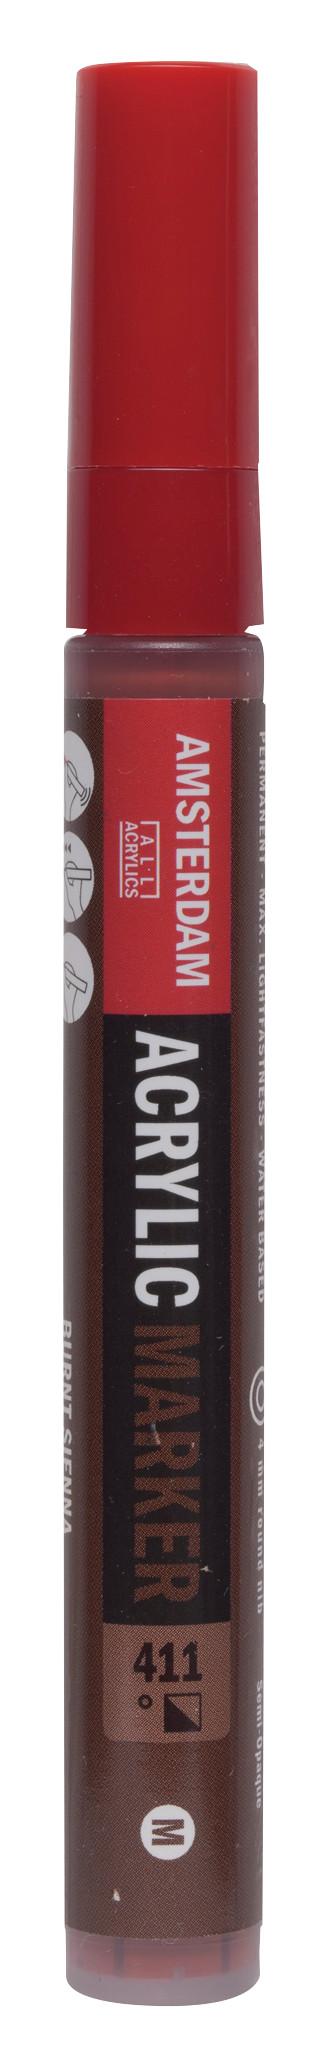 Amsterdam Acrylic Marker 4 mm Burnt Sienna 411